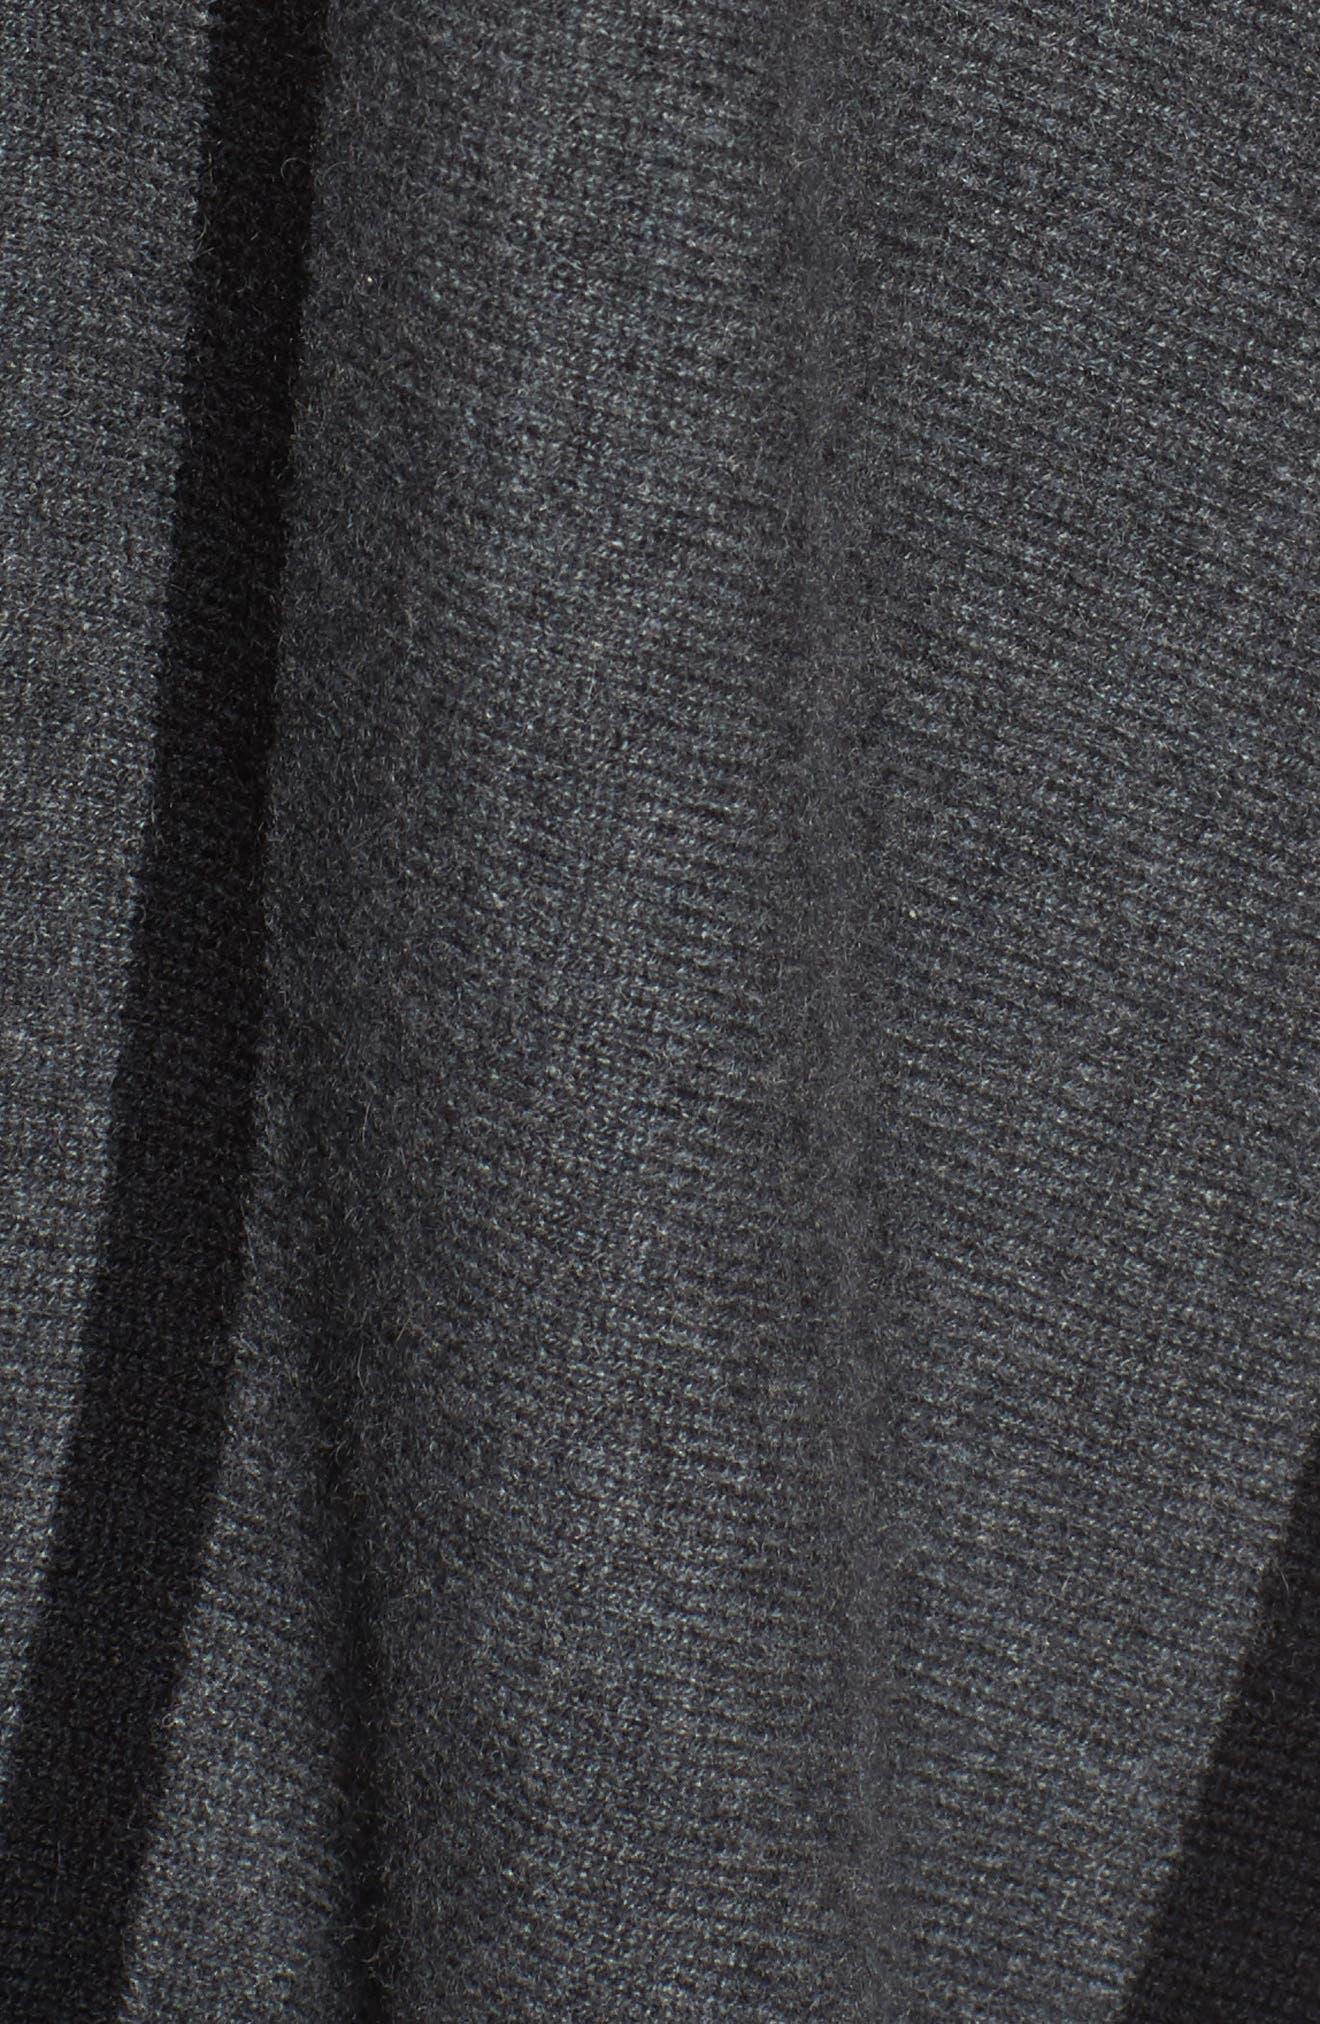 Island Stripe Cashmere Poncho,                             Alternate thumbnail 5, color,                             Vapor Heather